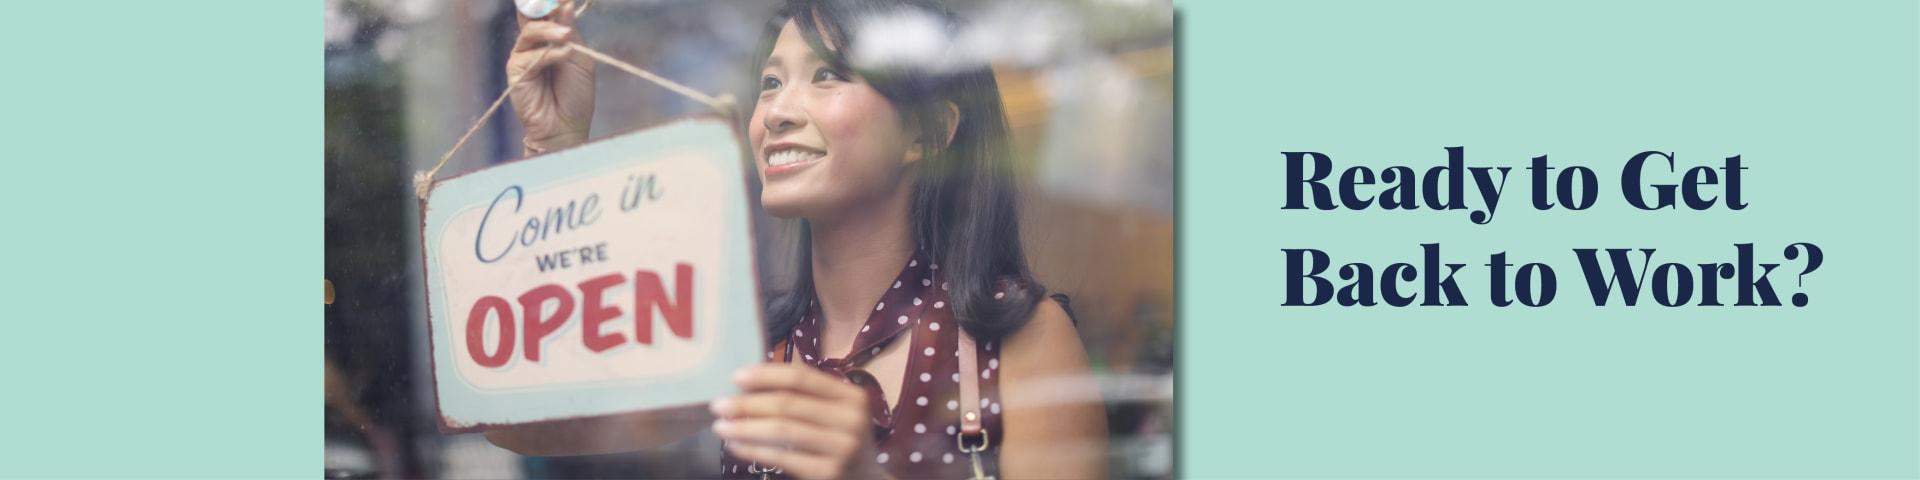 WiW-Banner-Asian-Woman-Flipping-Sign-w1920.jpg